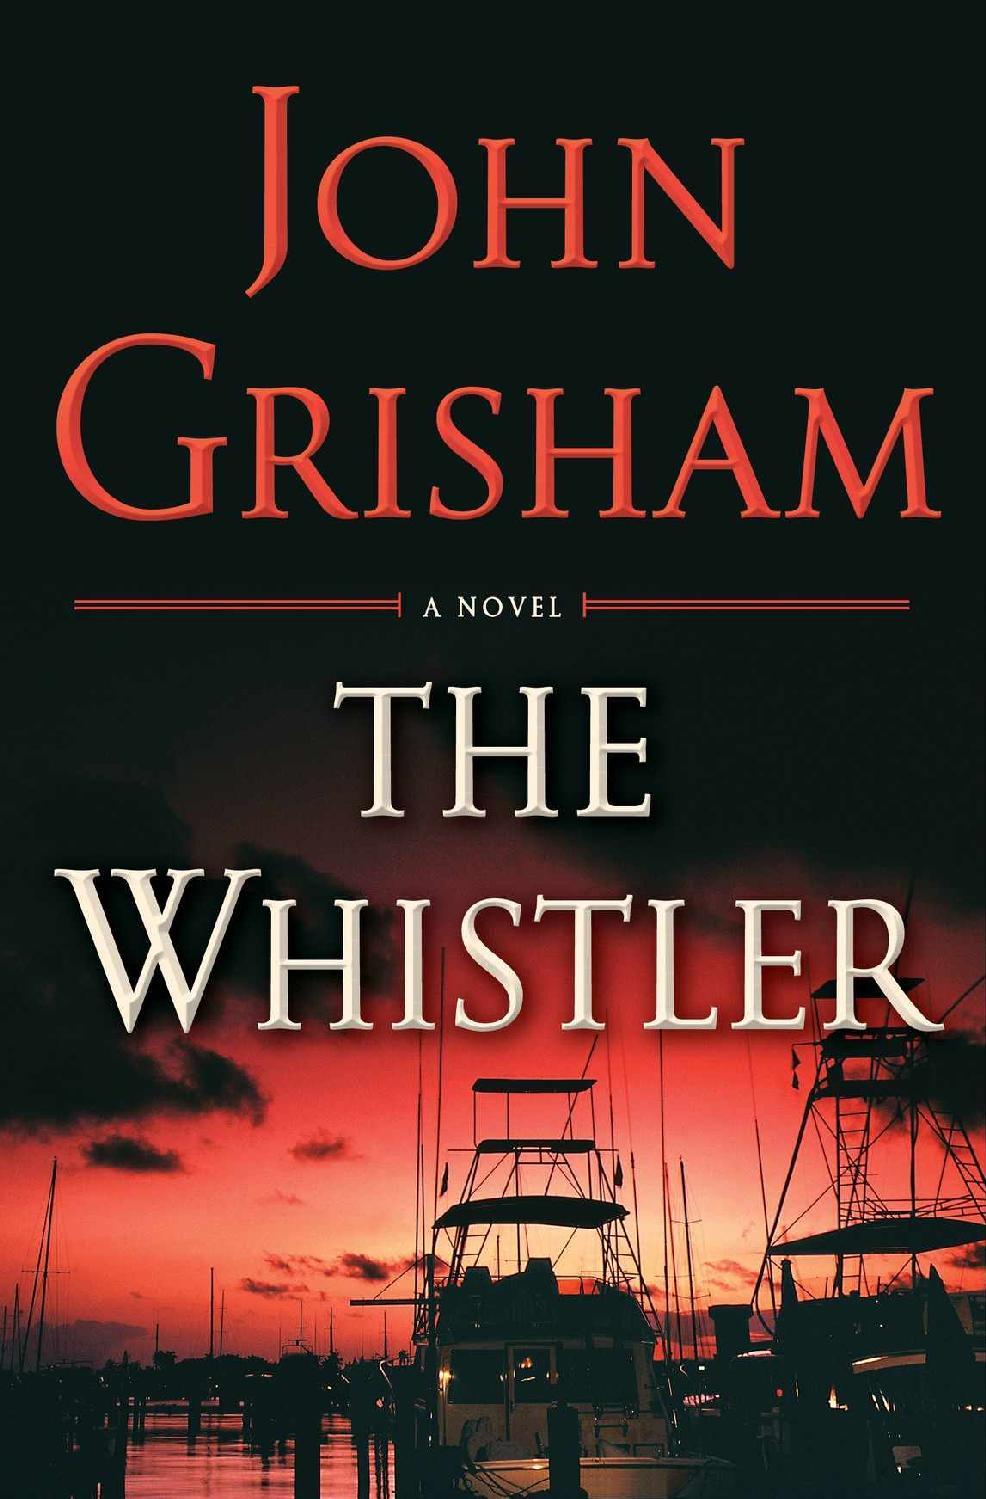 The Whistler - John Grisham [kindle] [mobi]